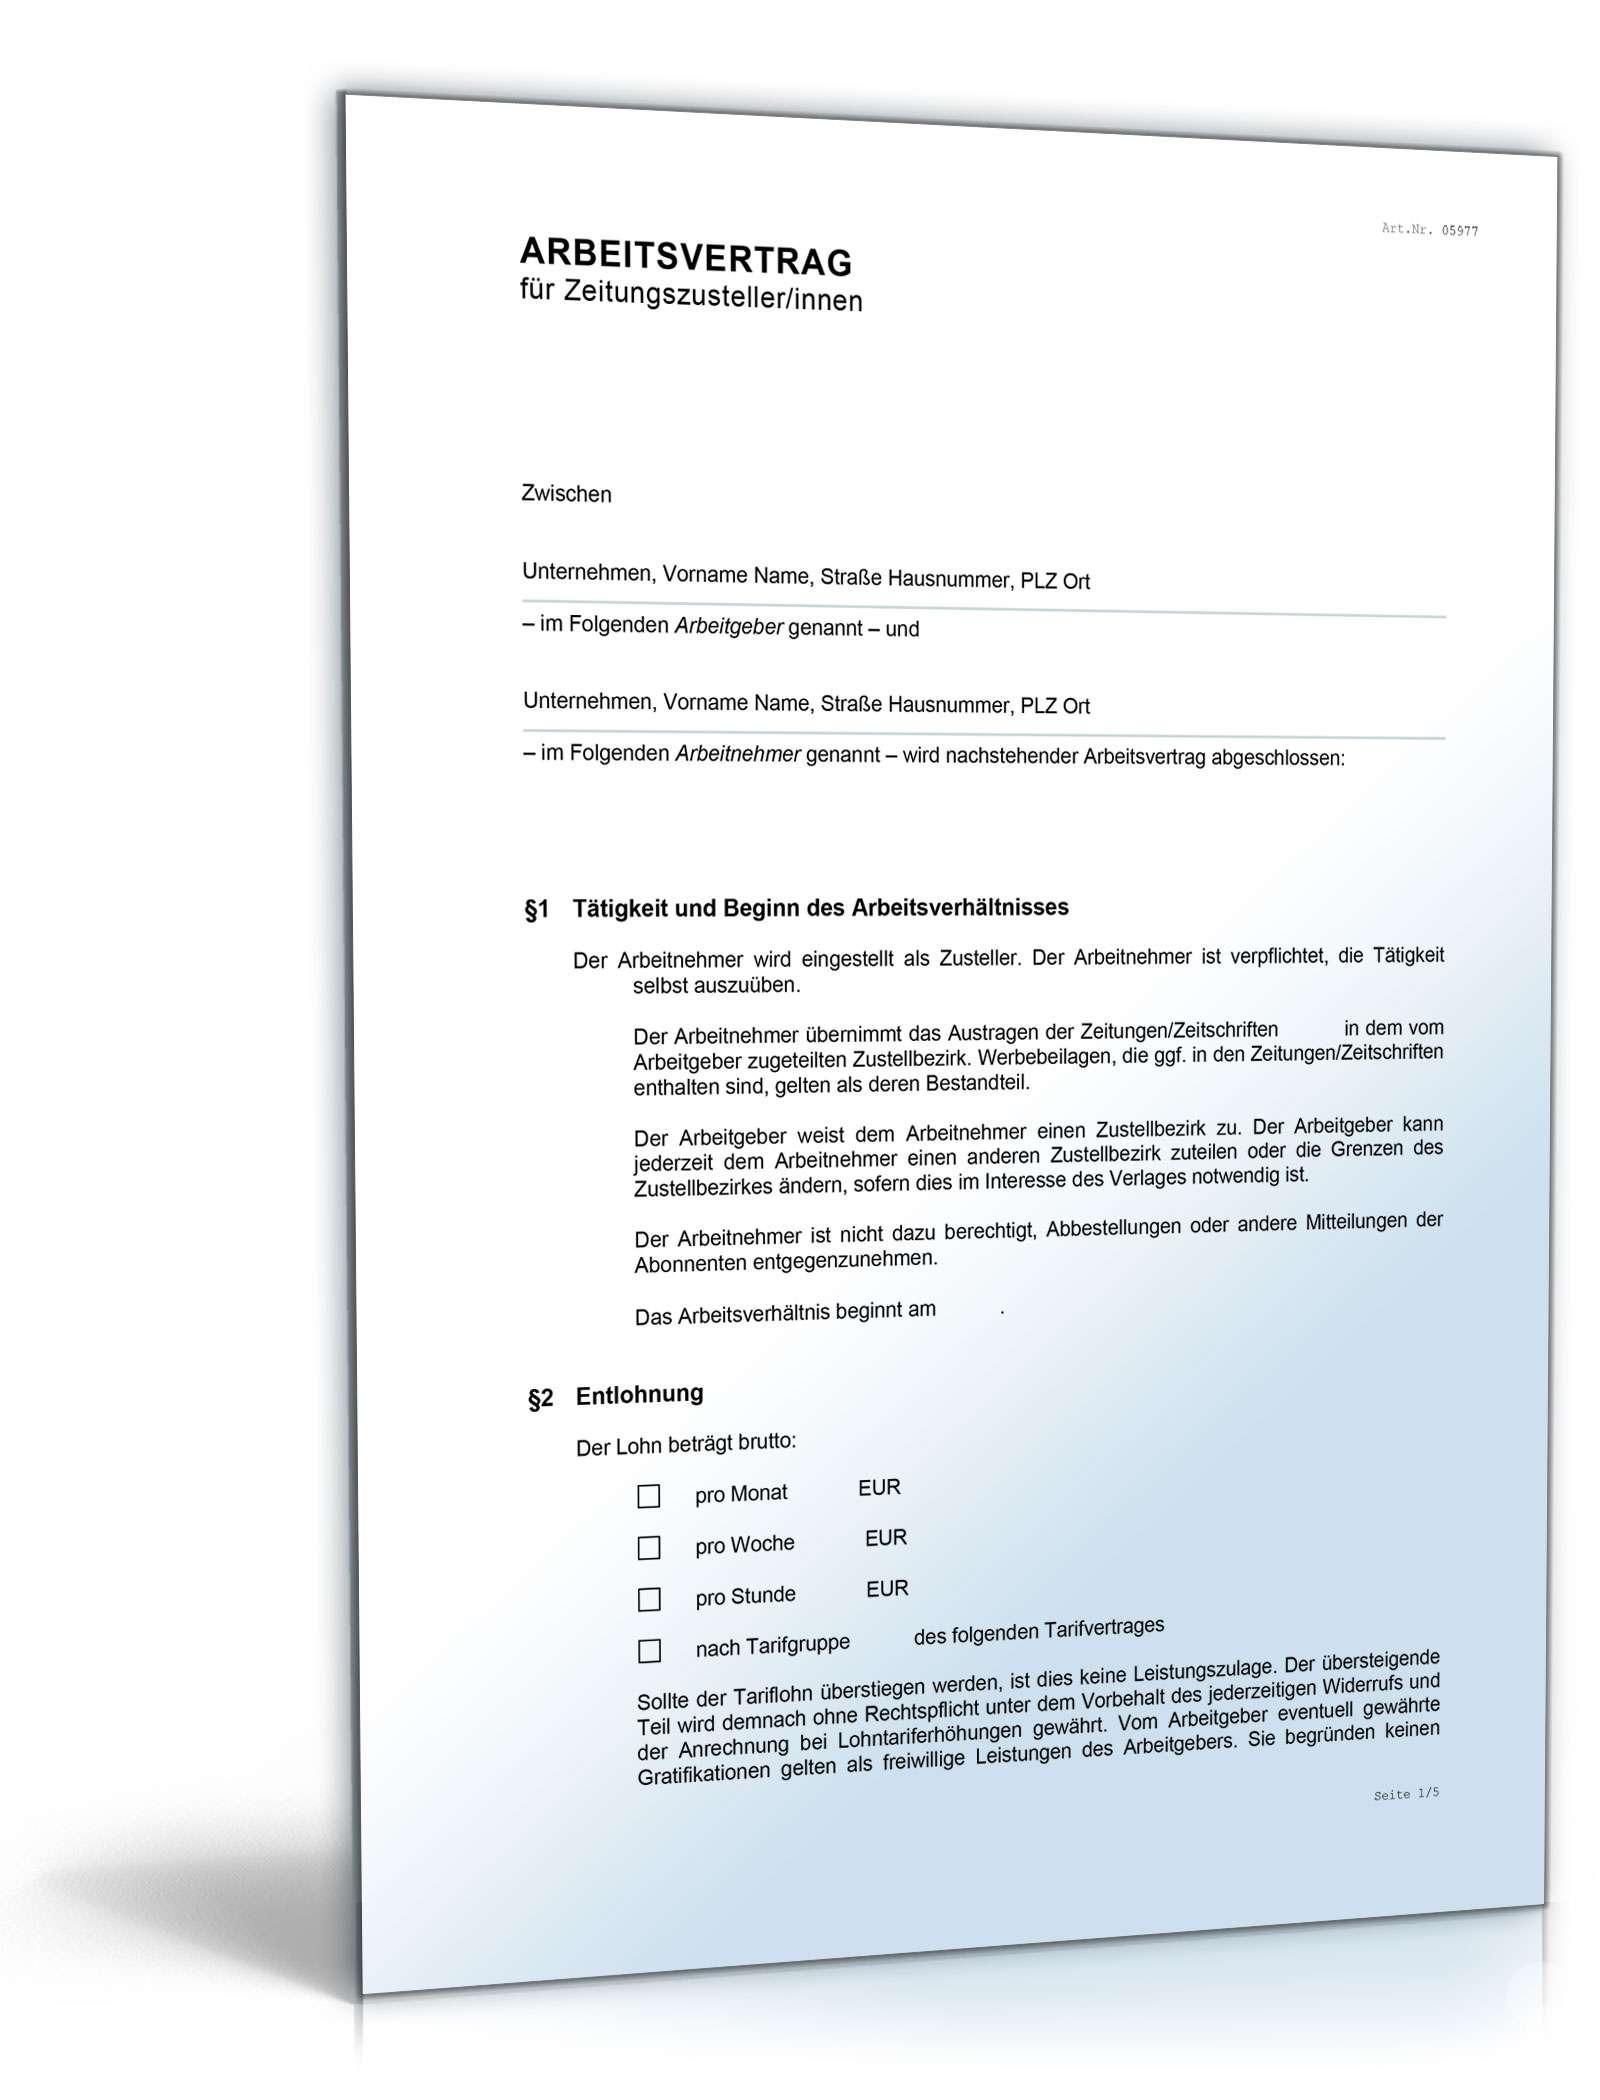 Musterbriefe Arbeitgeber : Arbeitsvertrag zeitungszusteller muster zum download